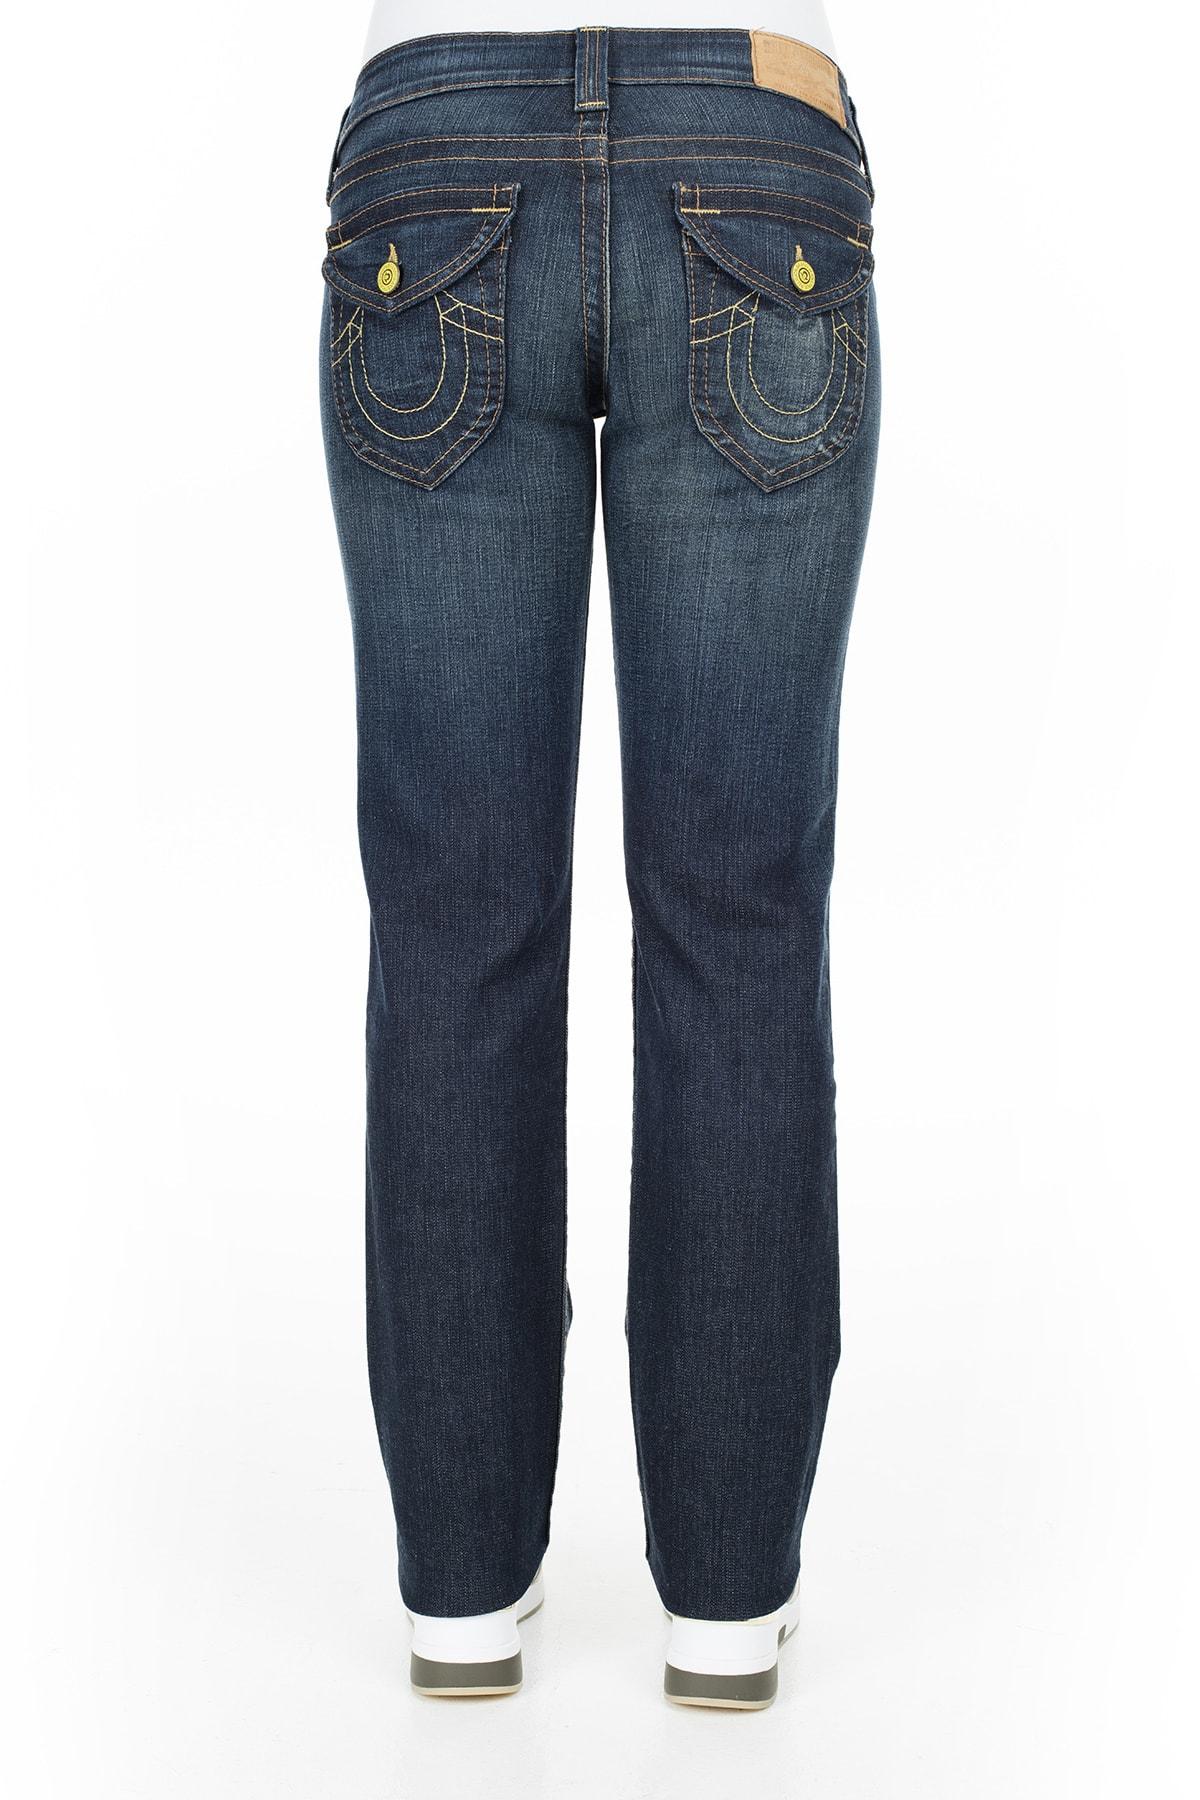 True Religion Jeans Kadın Kot Pantolon W102076E41D1 3